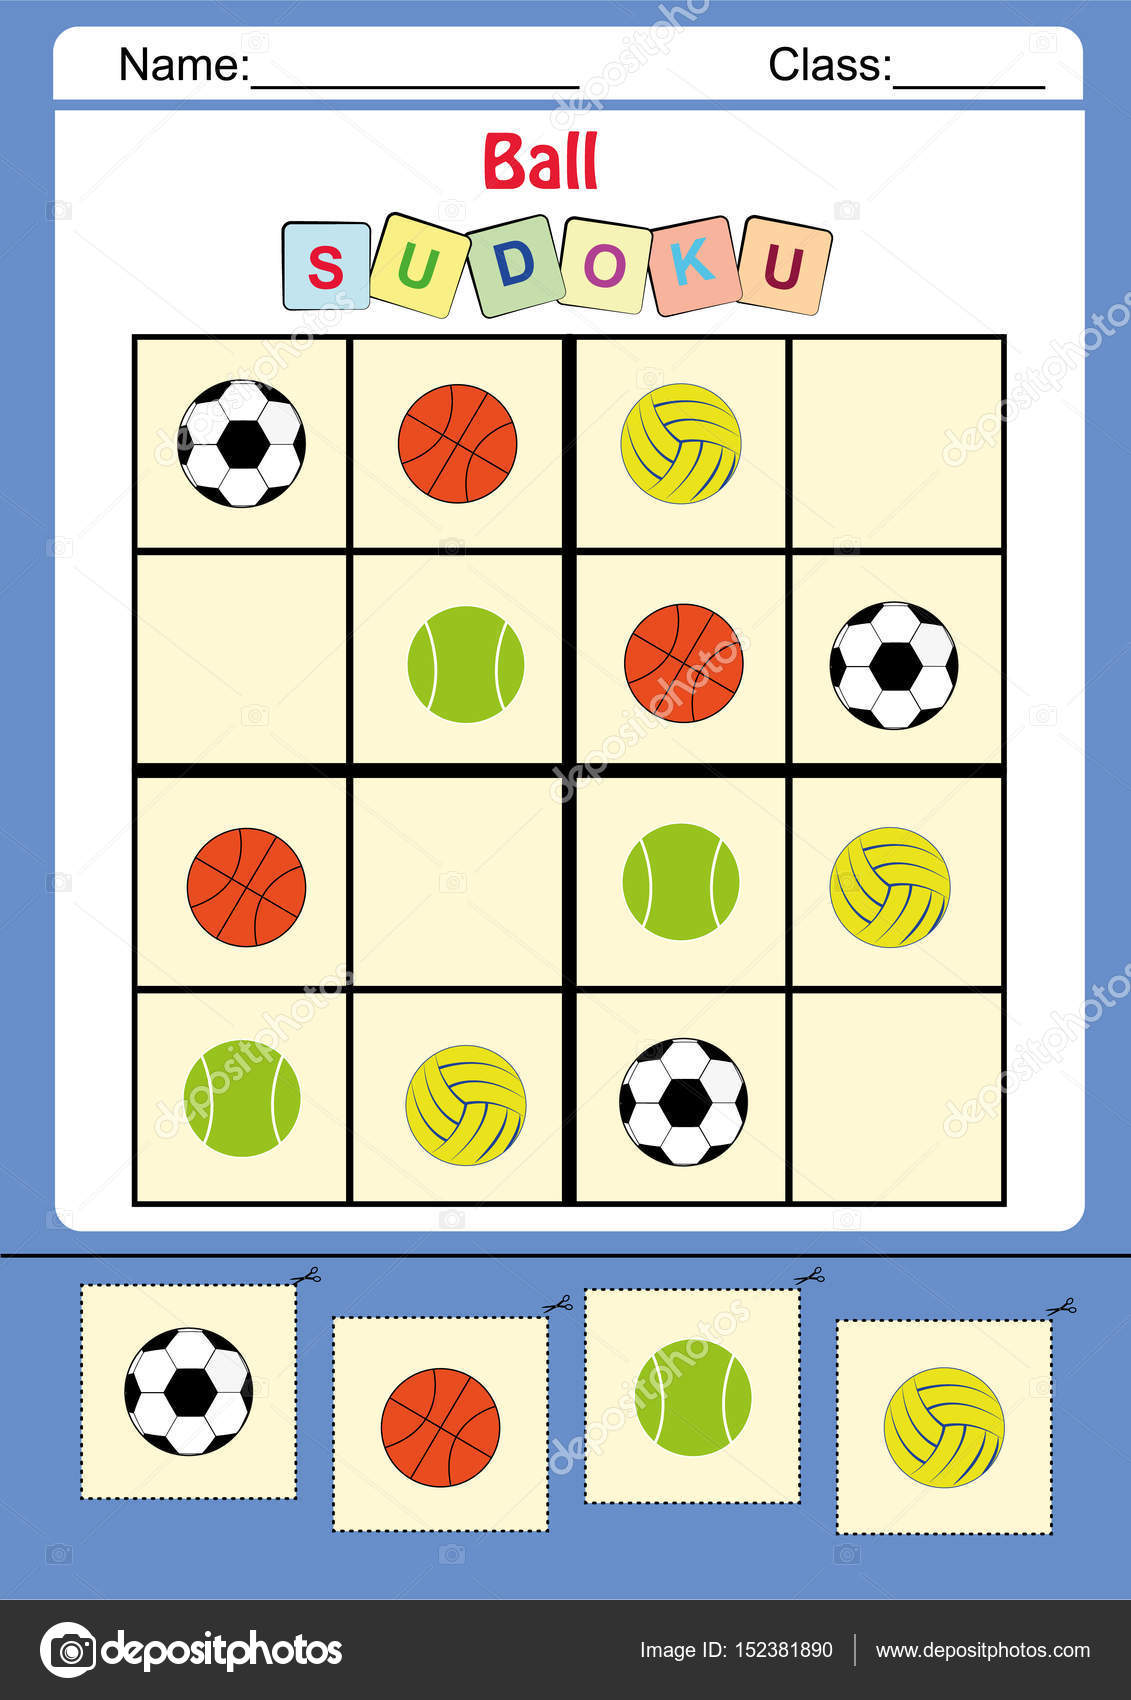 Funny picture sudoku for kids Photo kamilon 152381890 – Sudoku Worksheet